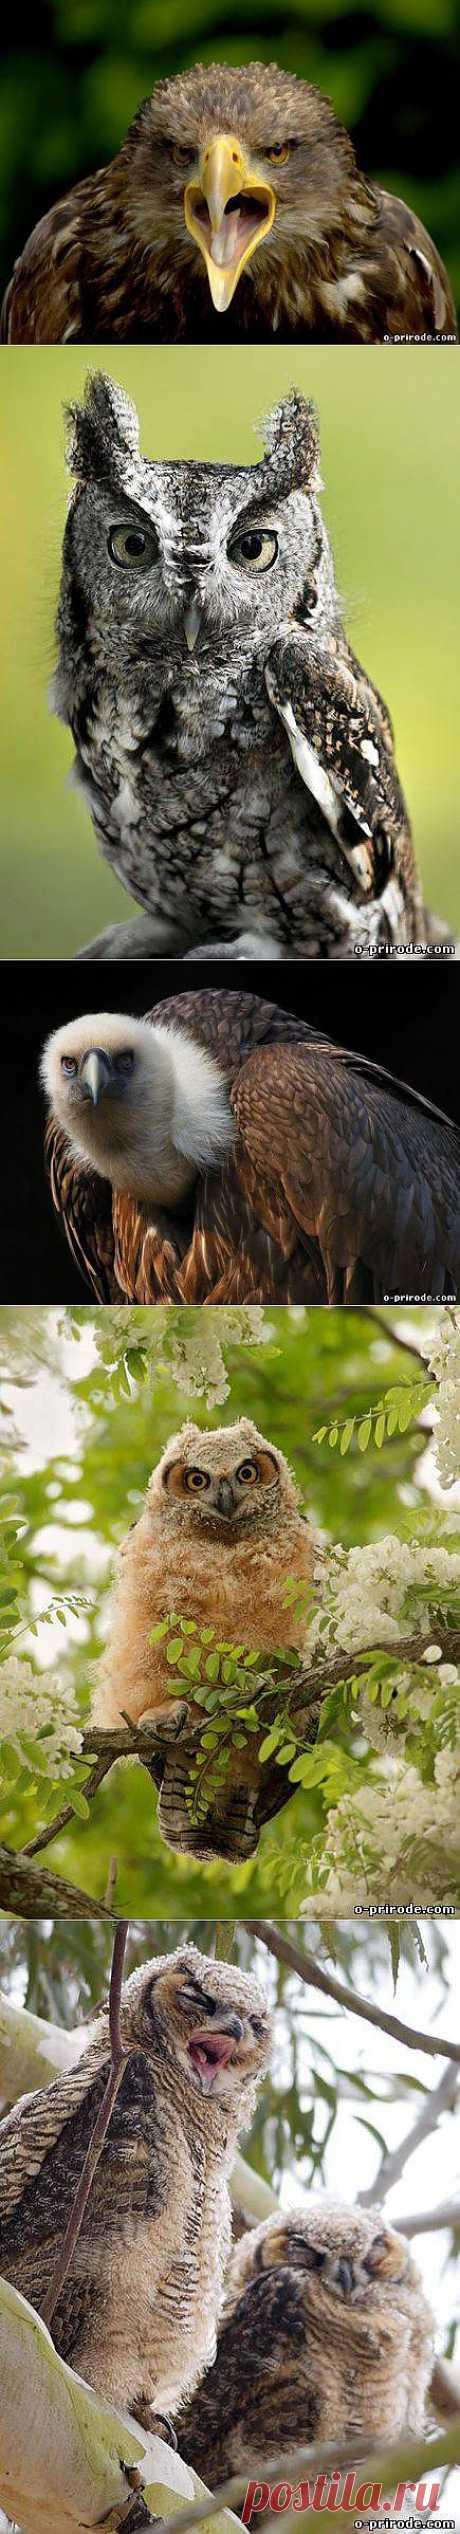 Птица охотник - Фото мир природы